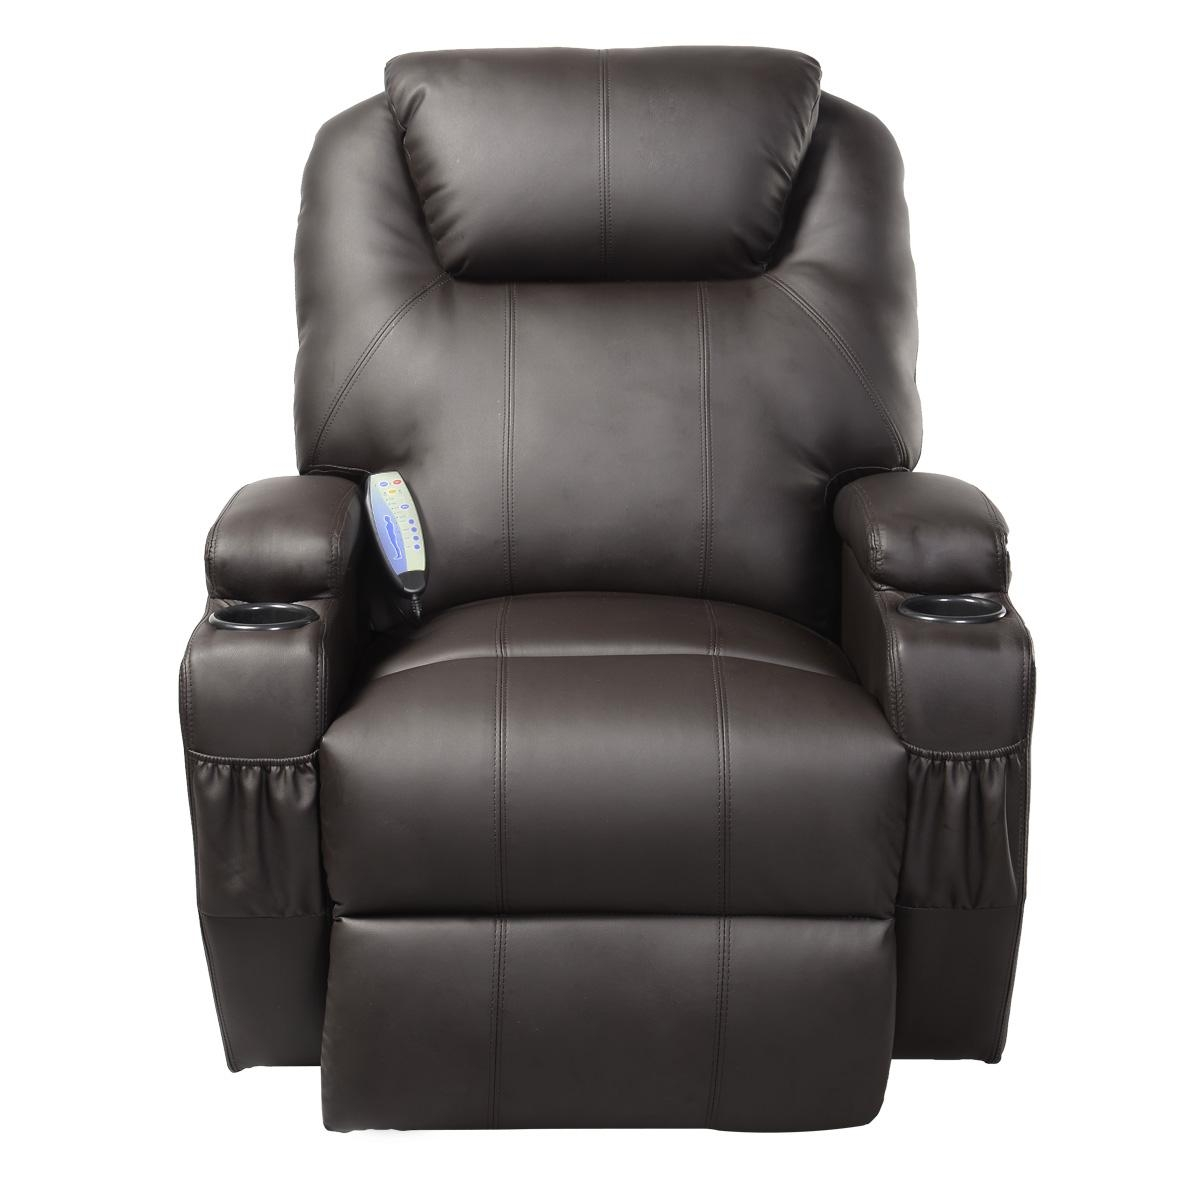 Costway Ergonomic Deluxe Massage Recliner Sofa Chair Lounge Regarding Sofa Chair Recliner (Image 8 of 20)